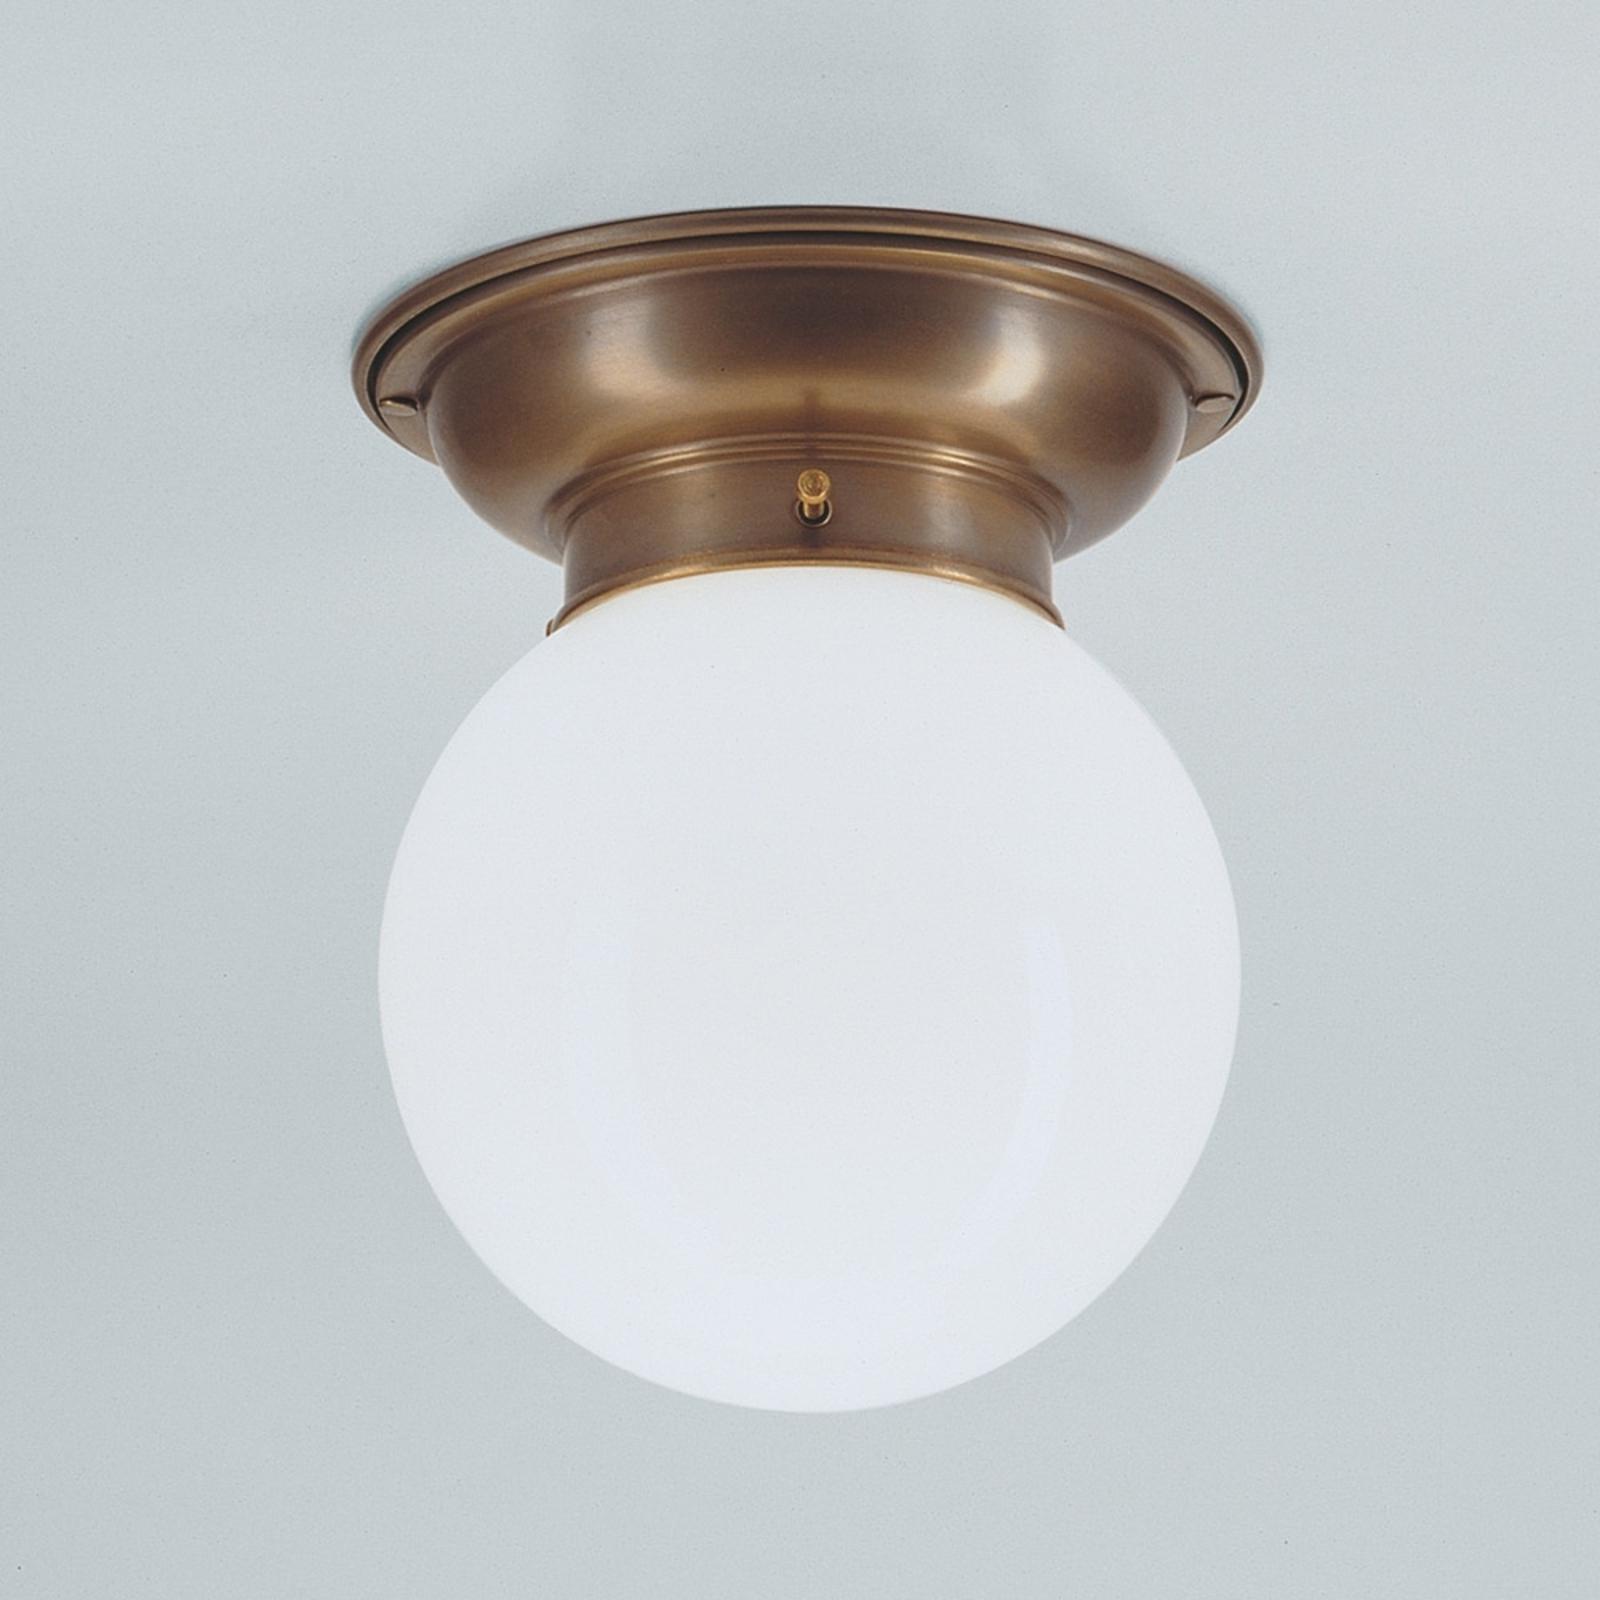 Plafondlamp Jim - made in Germany